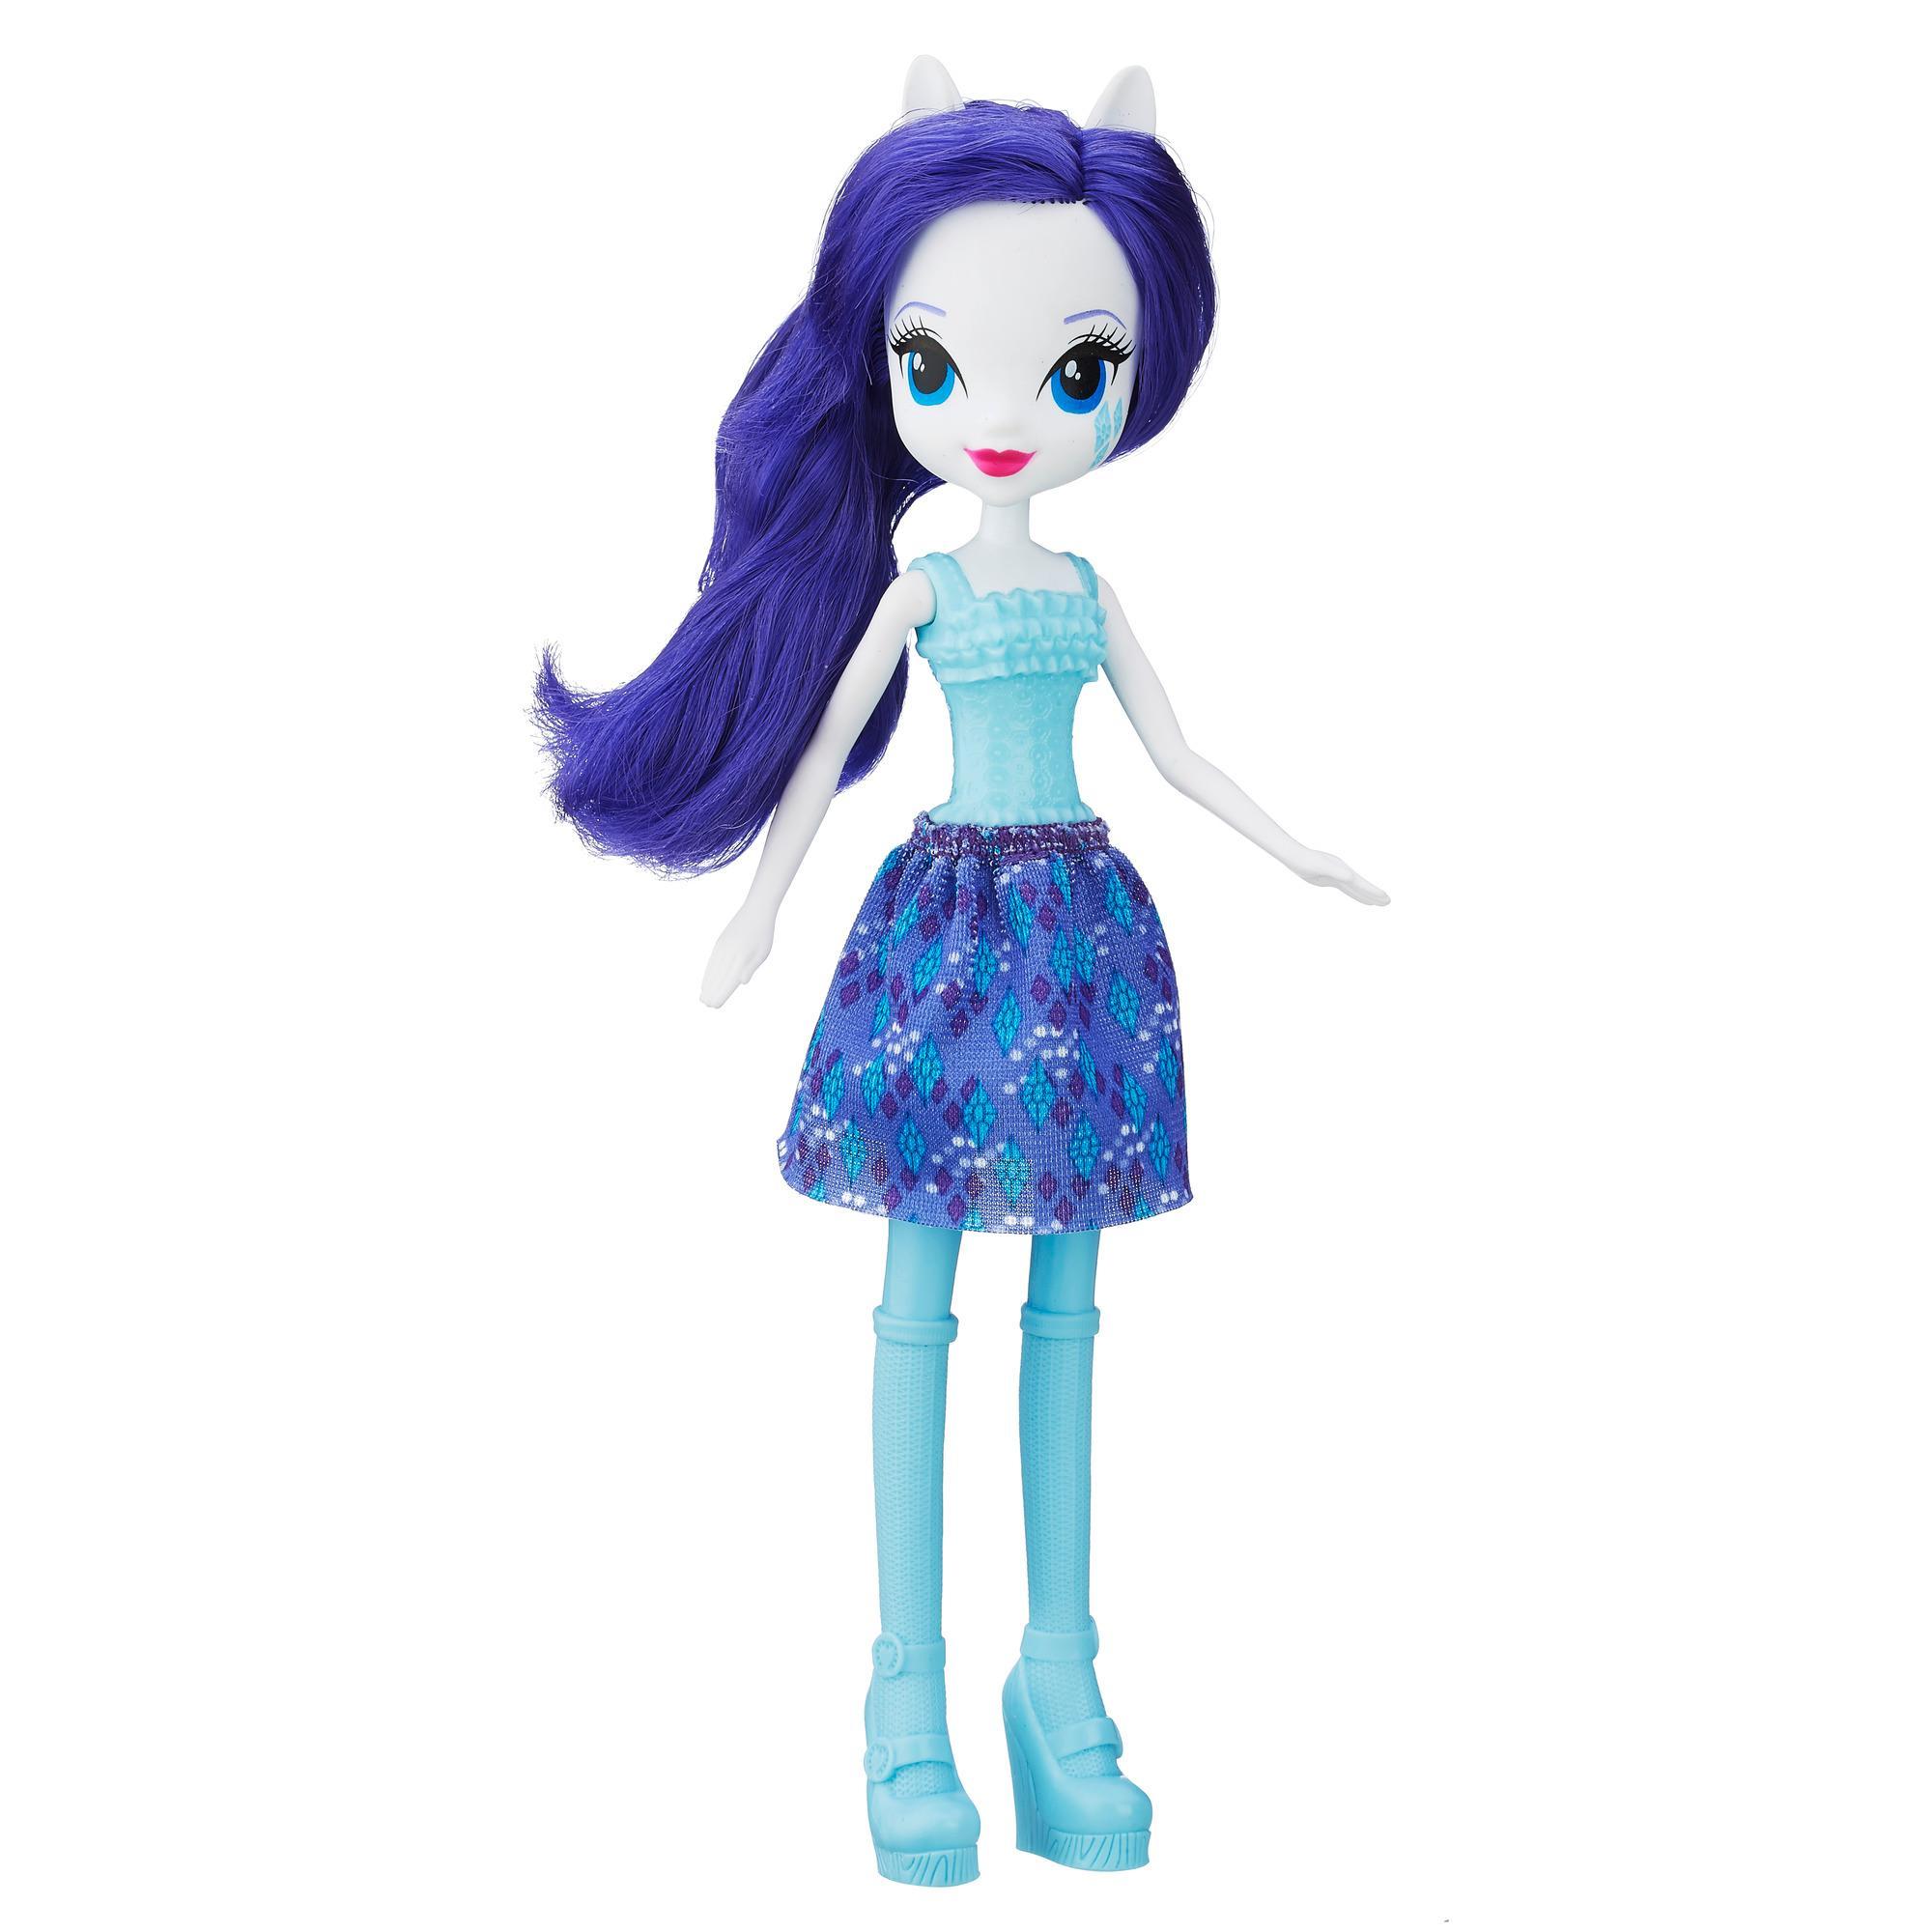 My Little Pony Equestria Girls Rarity Basic Doll